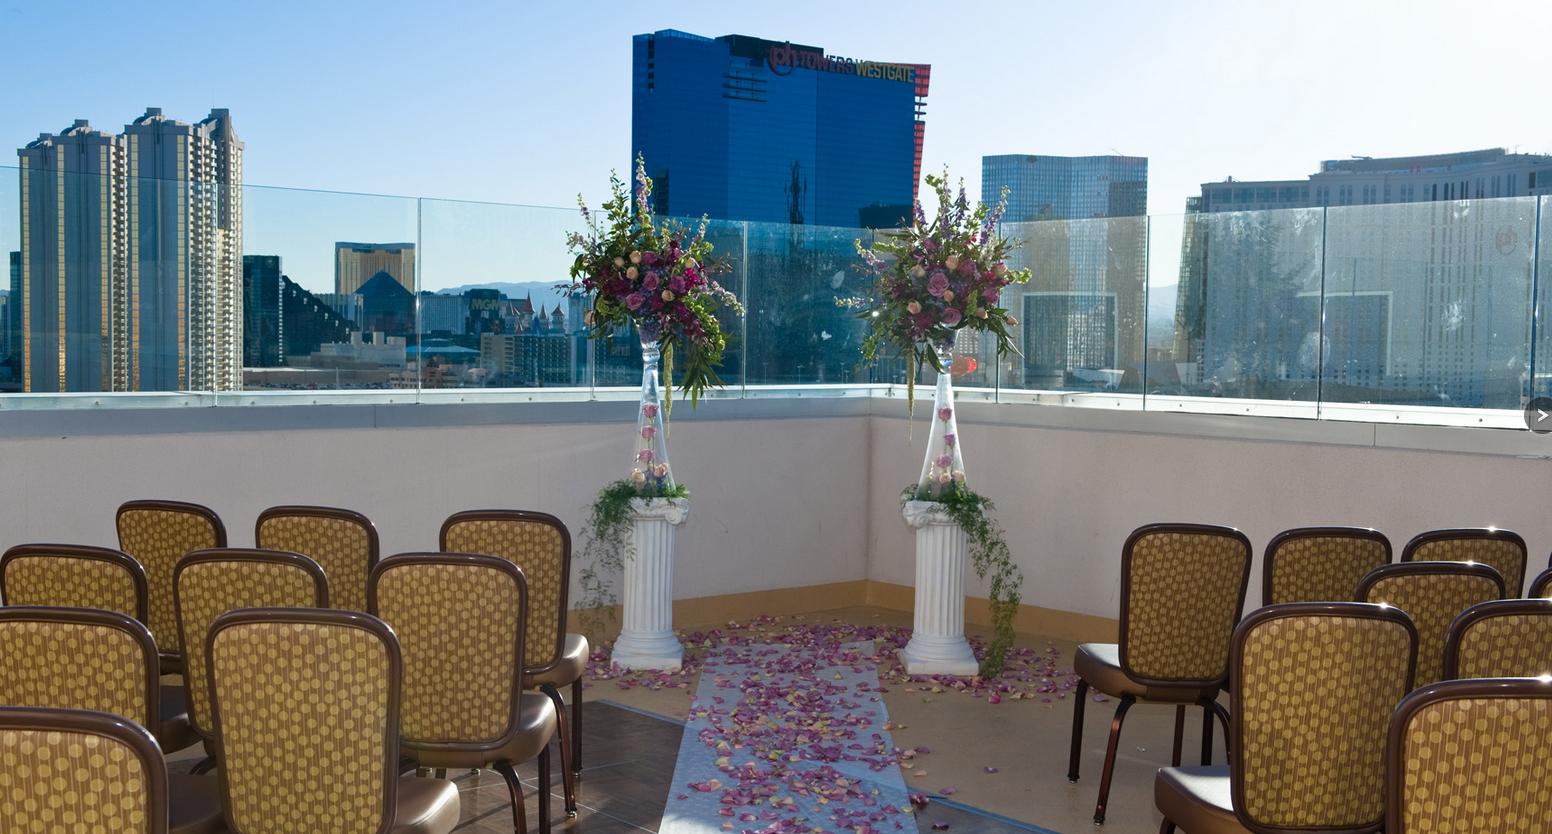 Wedding Reception Venues Vegas : Ultimate vegas wedding venue guide rooftop weddings at platinum las ? little